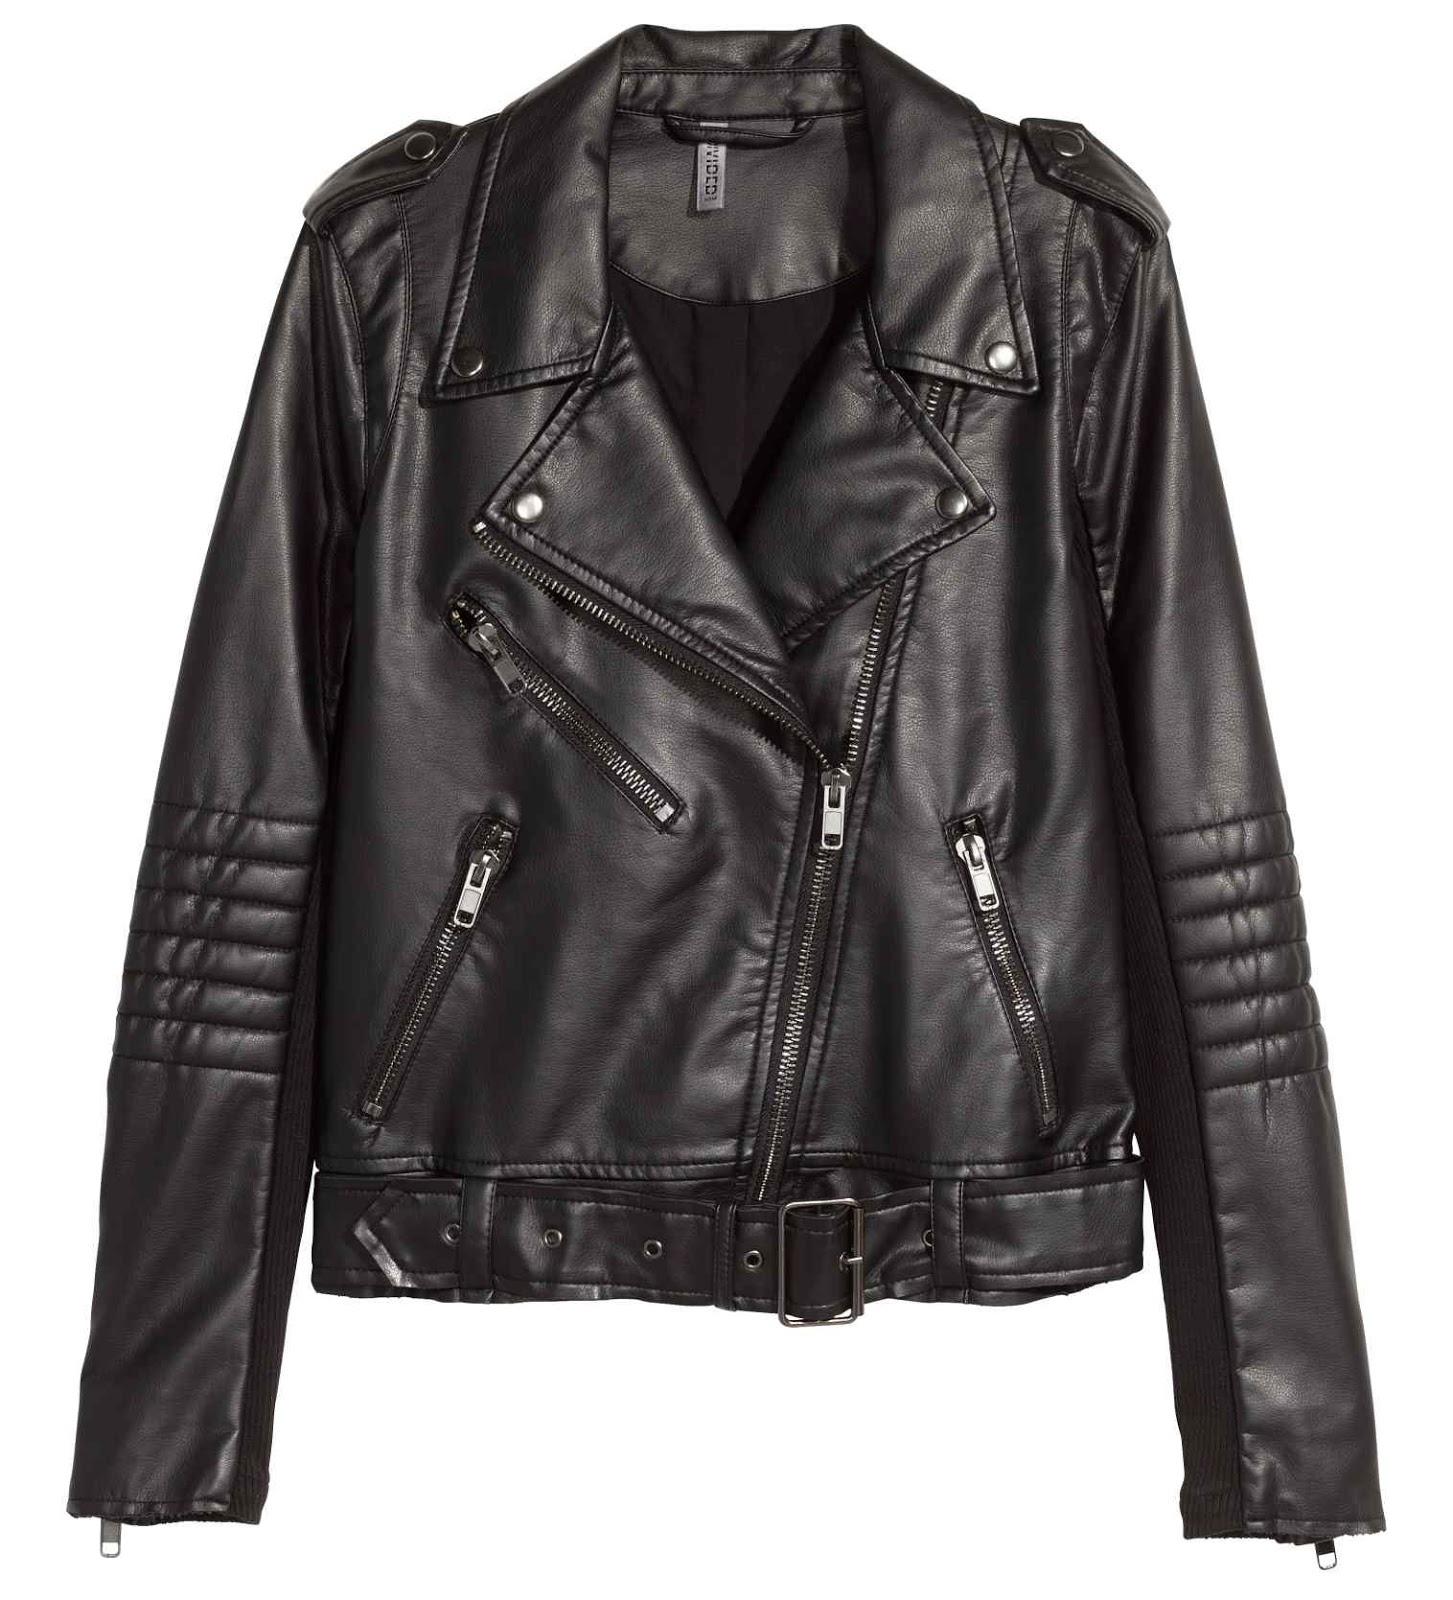 5 MUST-HAVE JACKETS - The Biker Jacket